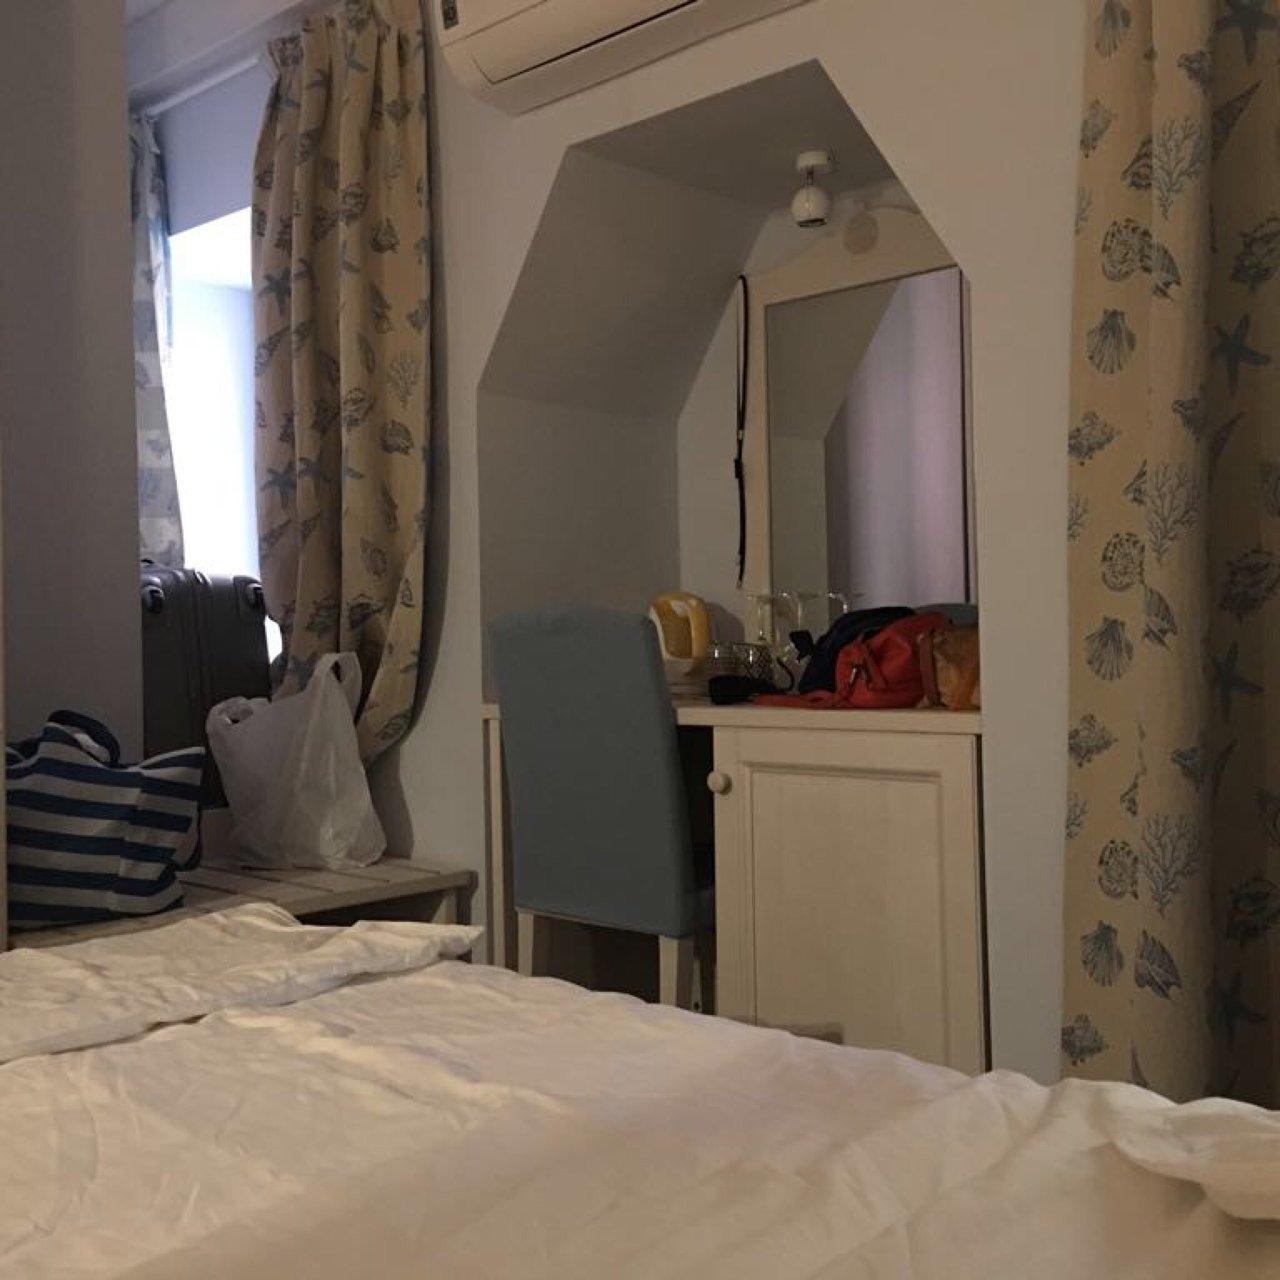 Case Arredate Con Gusto casa polo - guest house reviews (rovinj, croatia) - tripadvisor